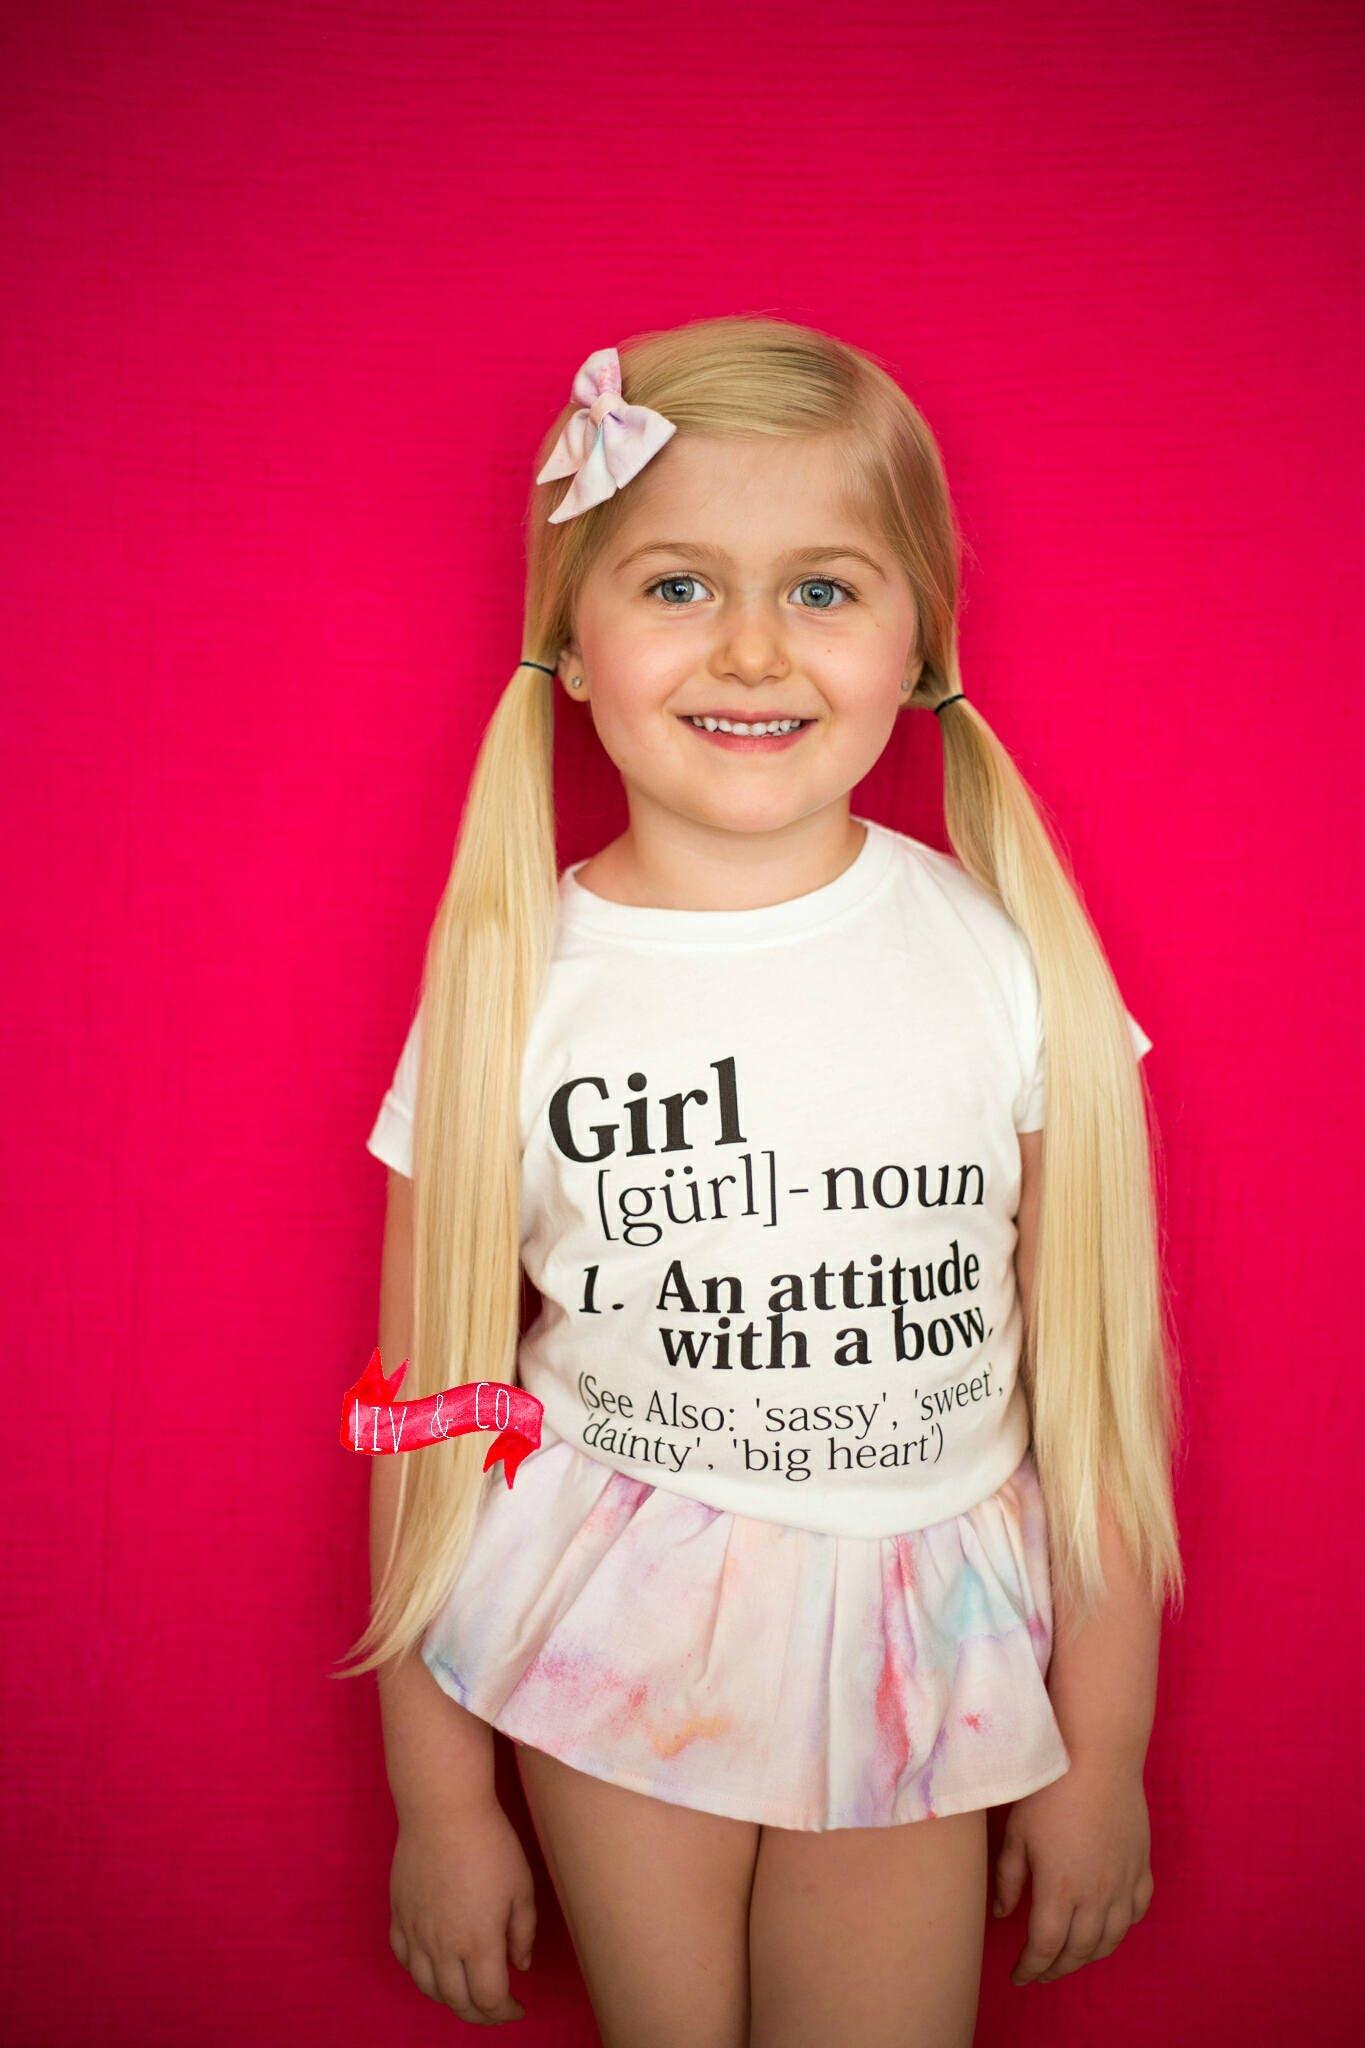 Funny Girls Shirt Girls Clothing Girls Tee Trendy Toddler